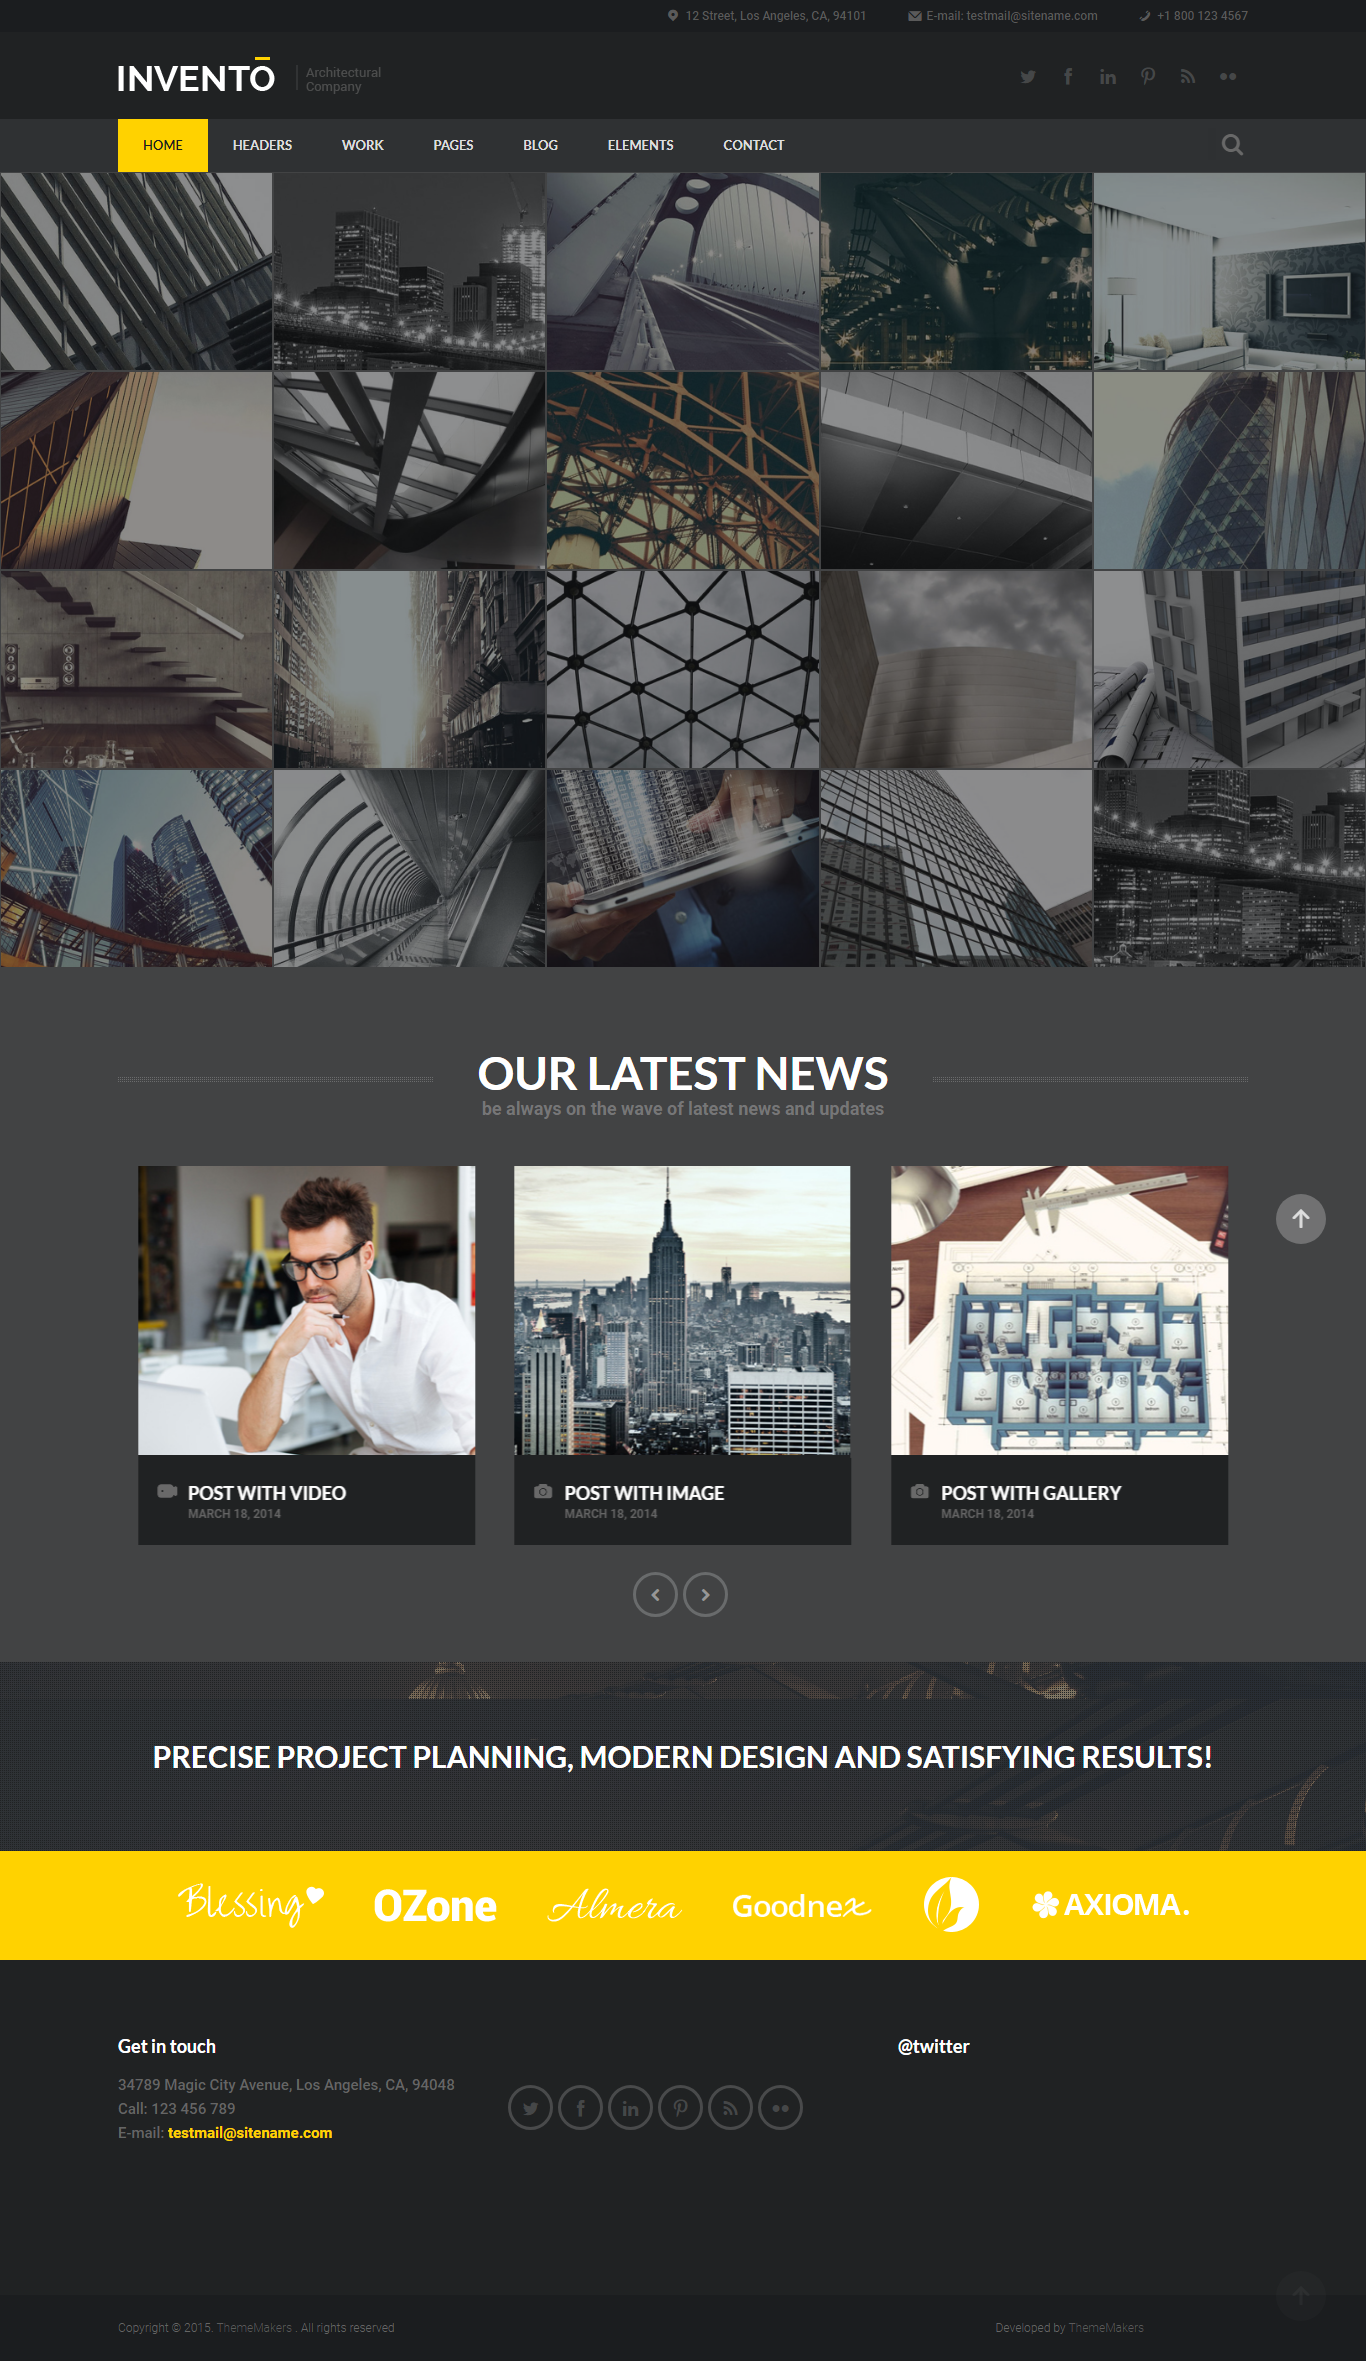 Invento Architecture Building Agency Template Web Design Agency Webpage Design Simple Web Design